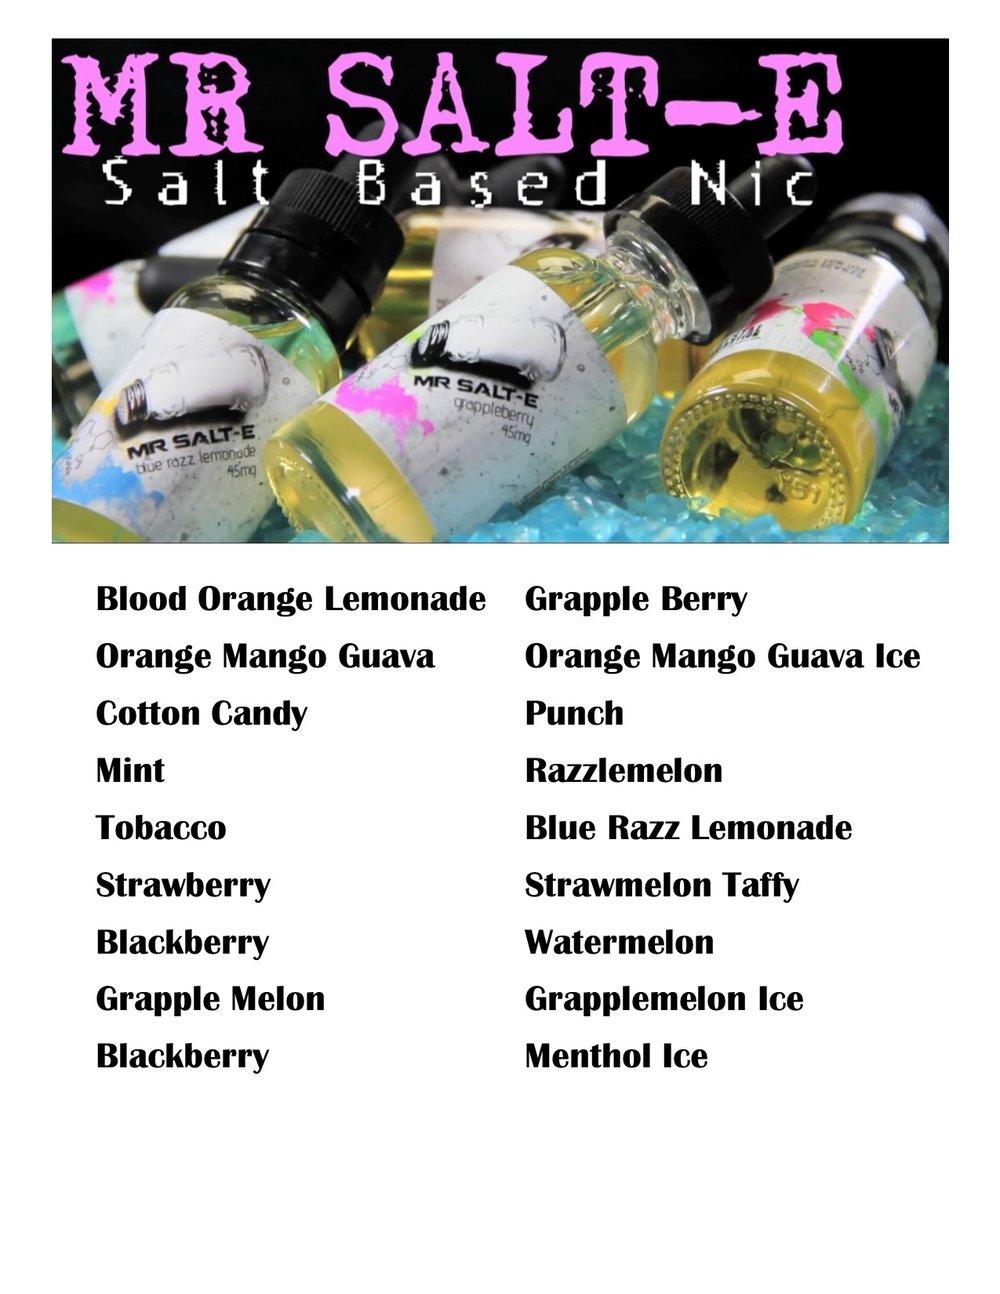 Mr Salt E Chain Vapors Liquid 45mg Nicotine Flavor Sheet For Binder